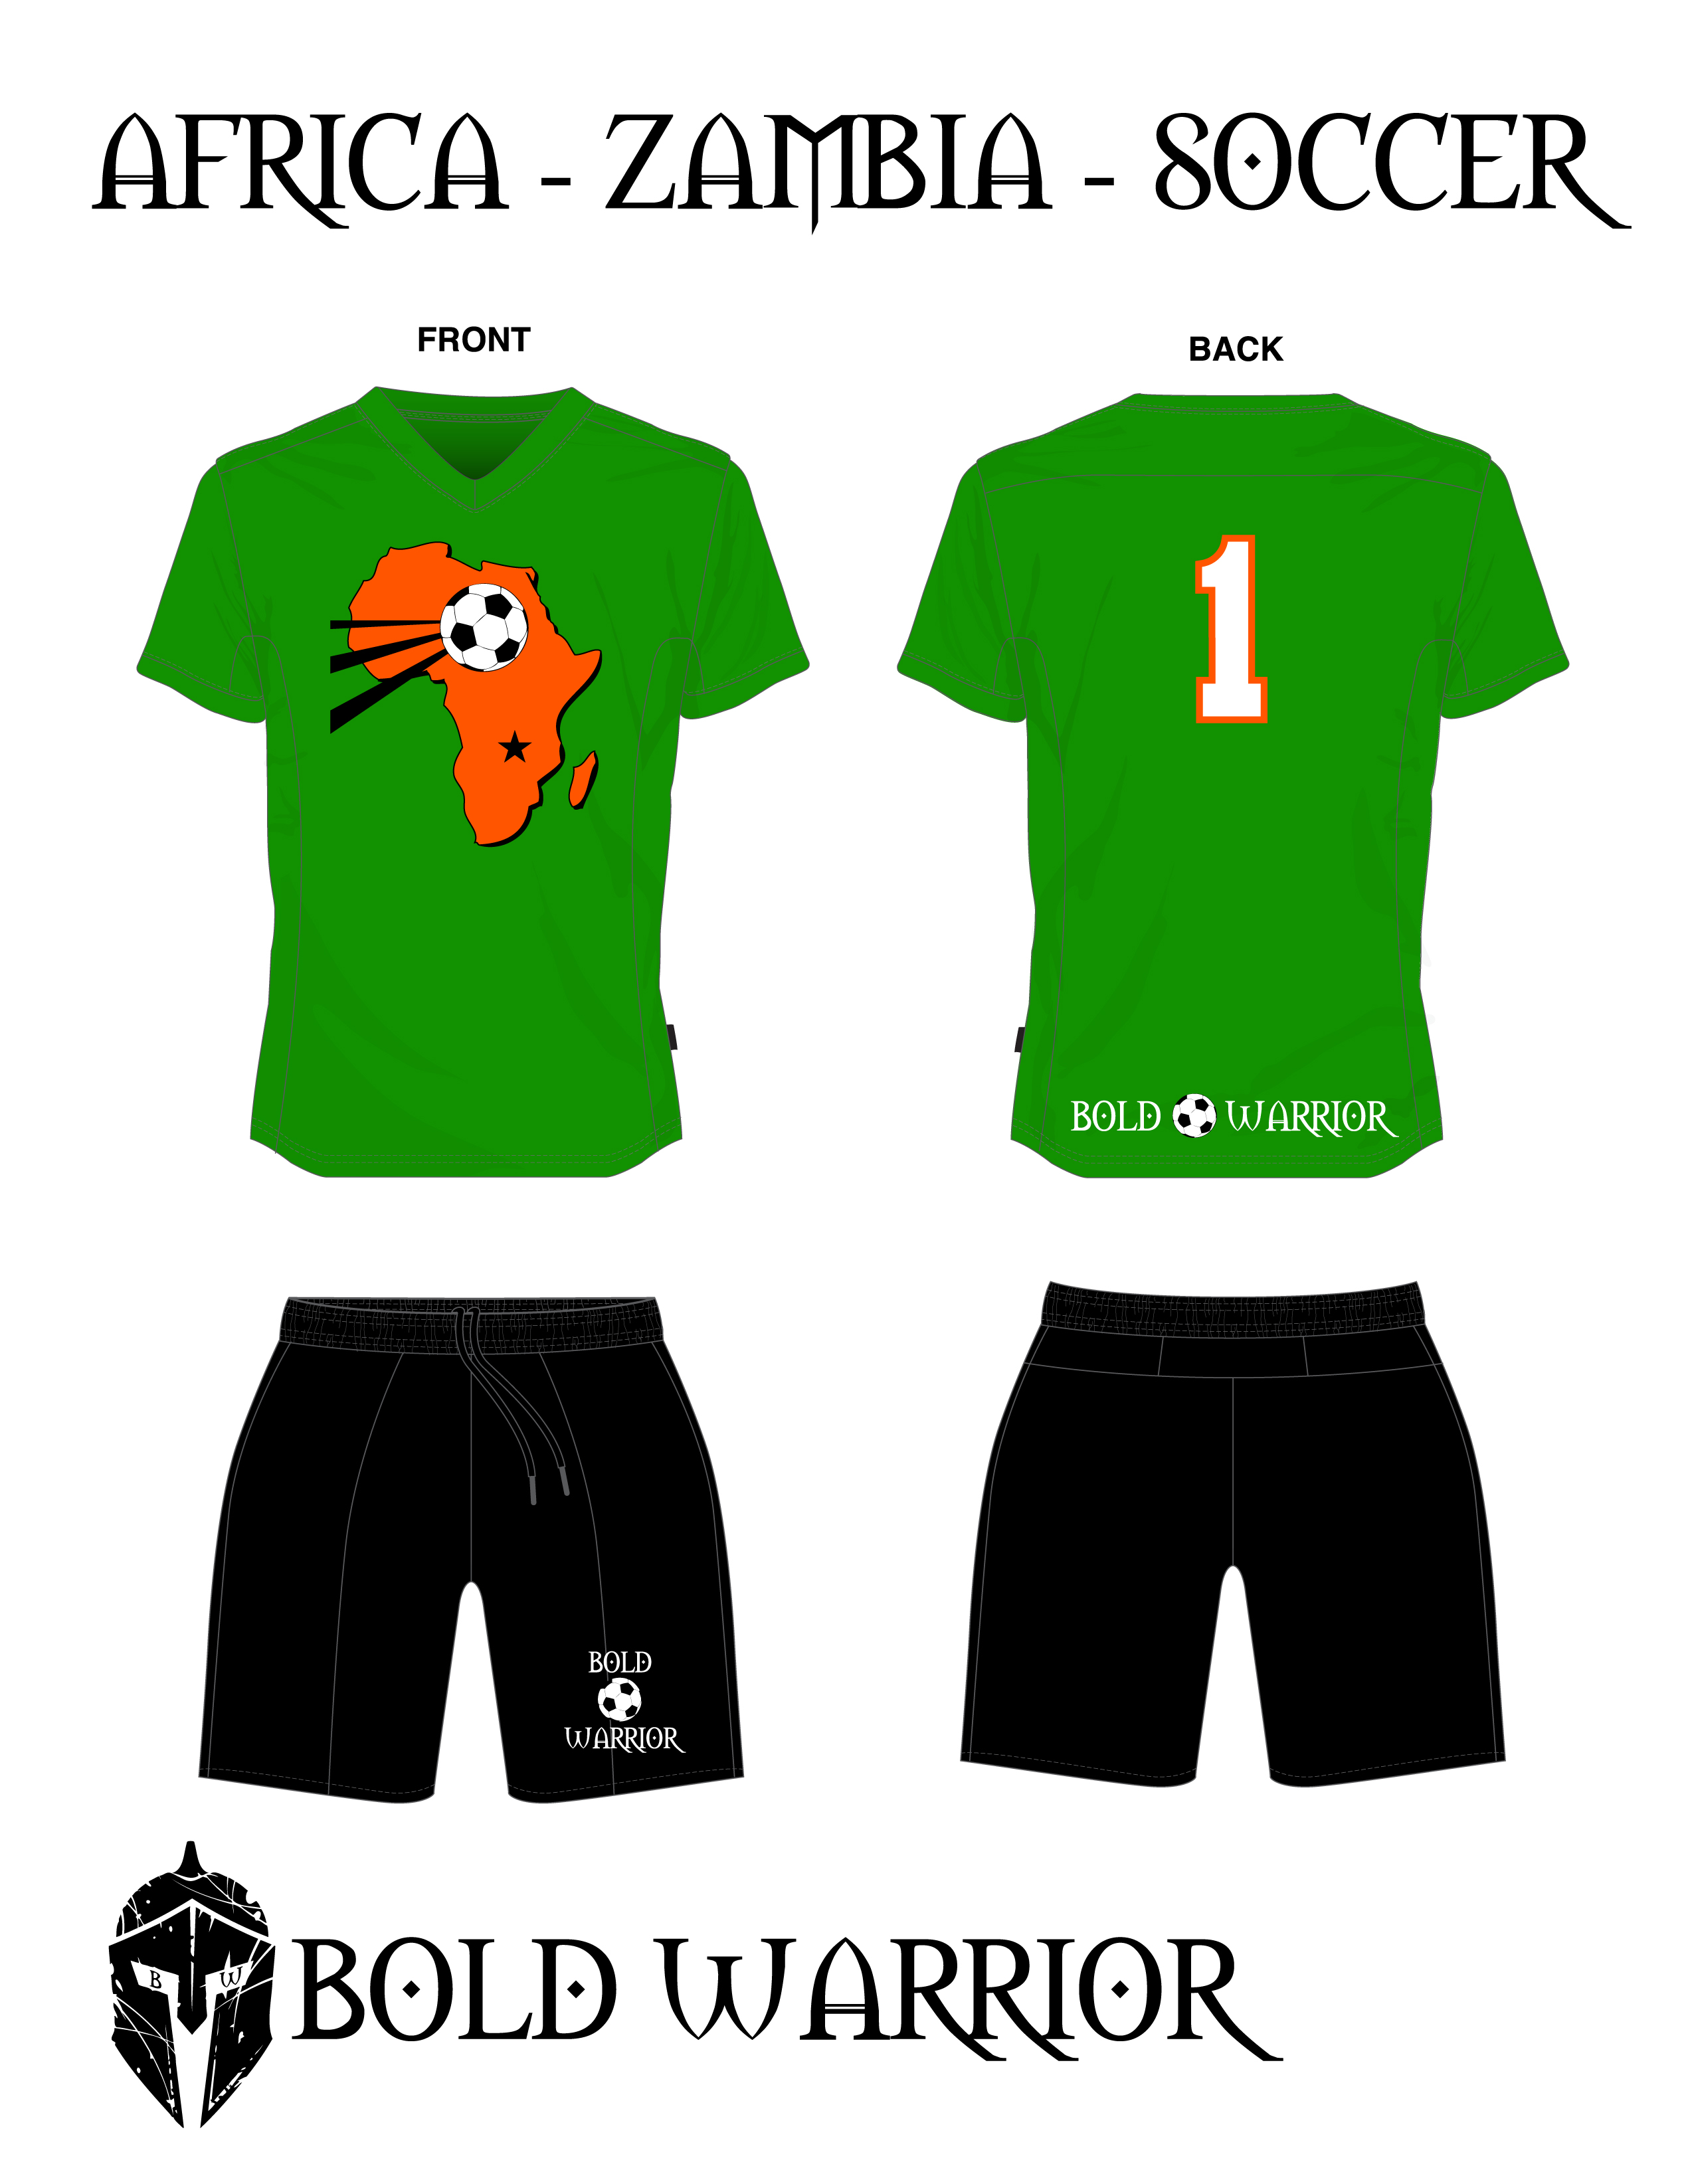 zambia_africa_soccer uniforms